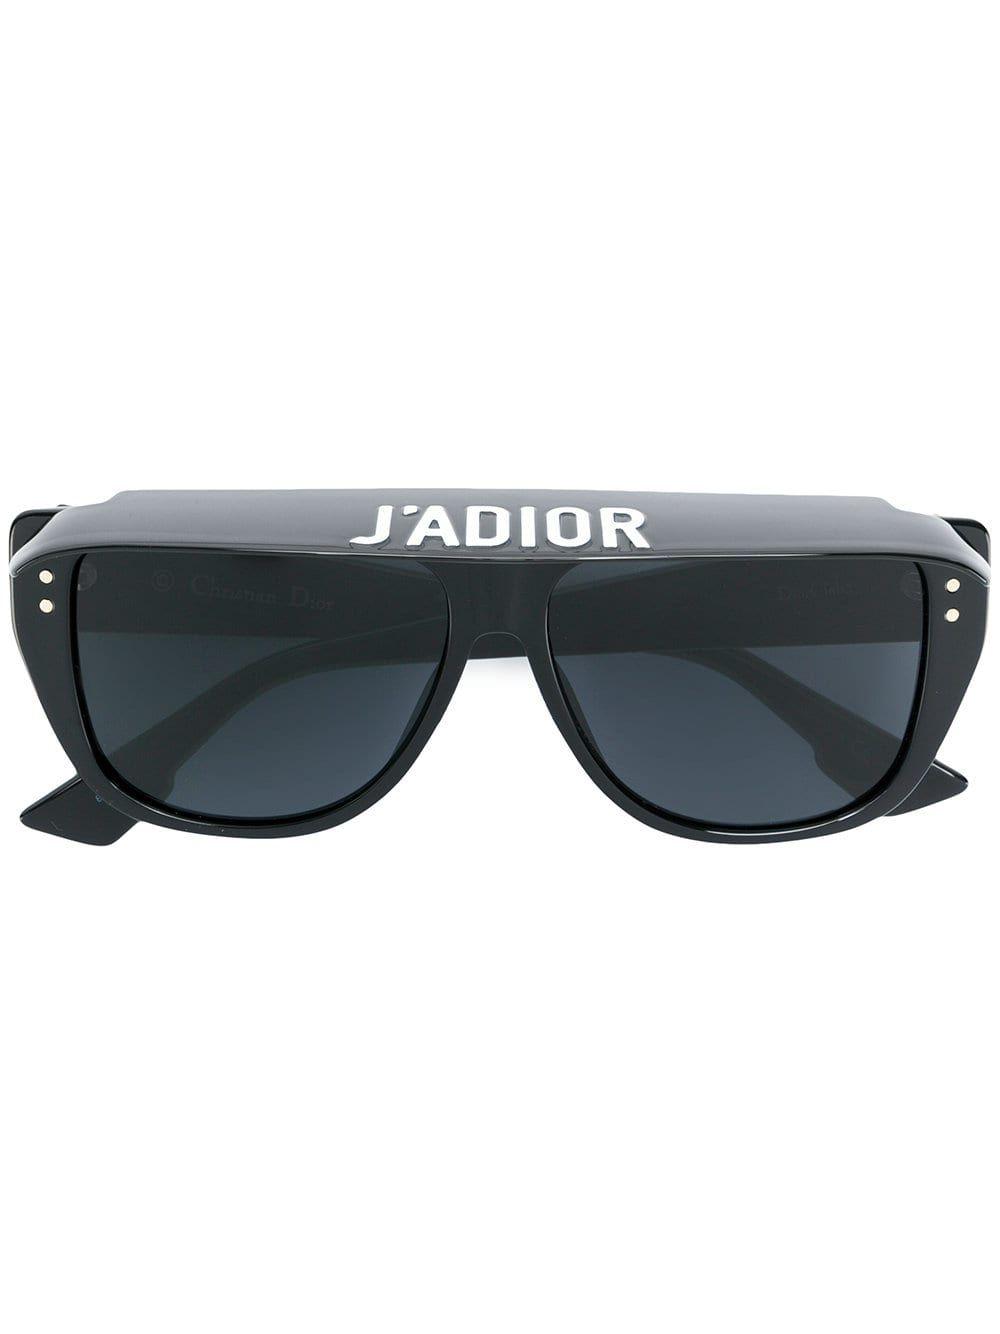 Dior Eyewear Óculos de sol  Dior Club 3    closet   Pinterest ... 89efc10463